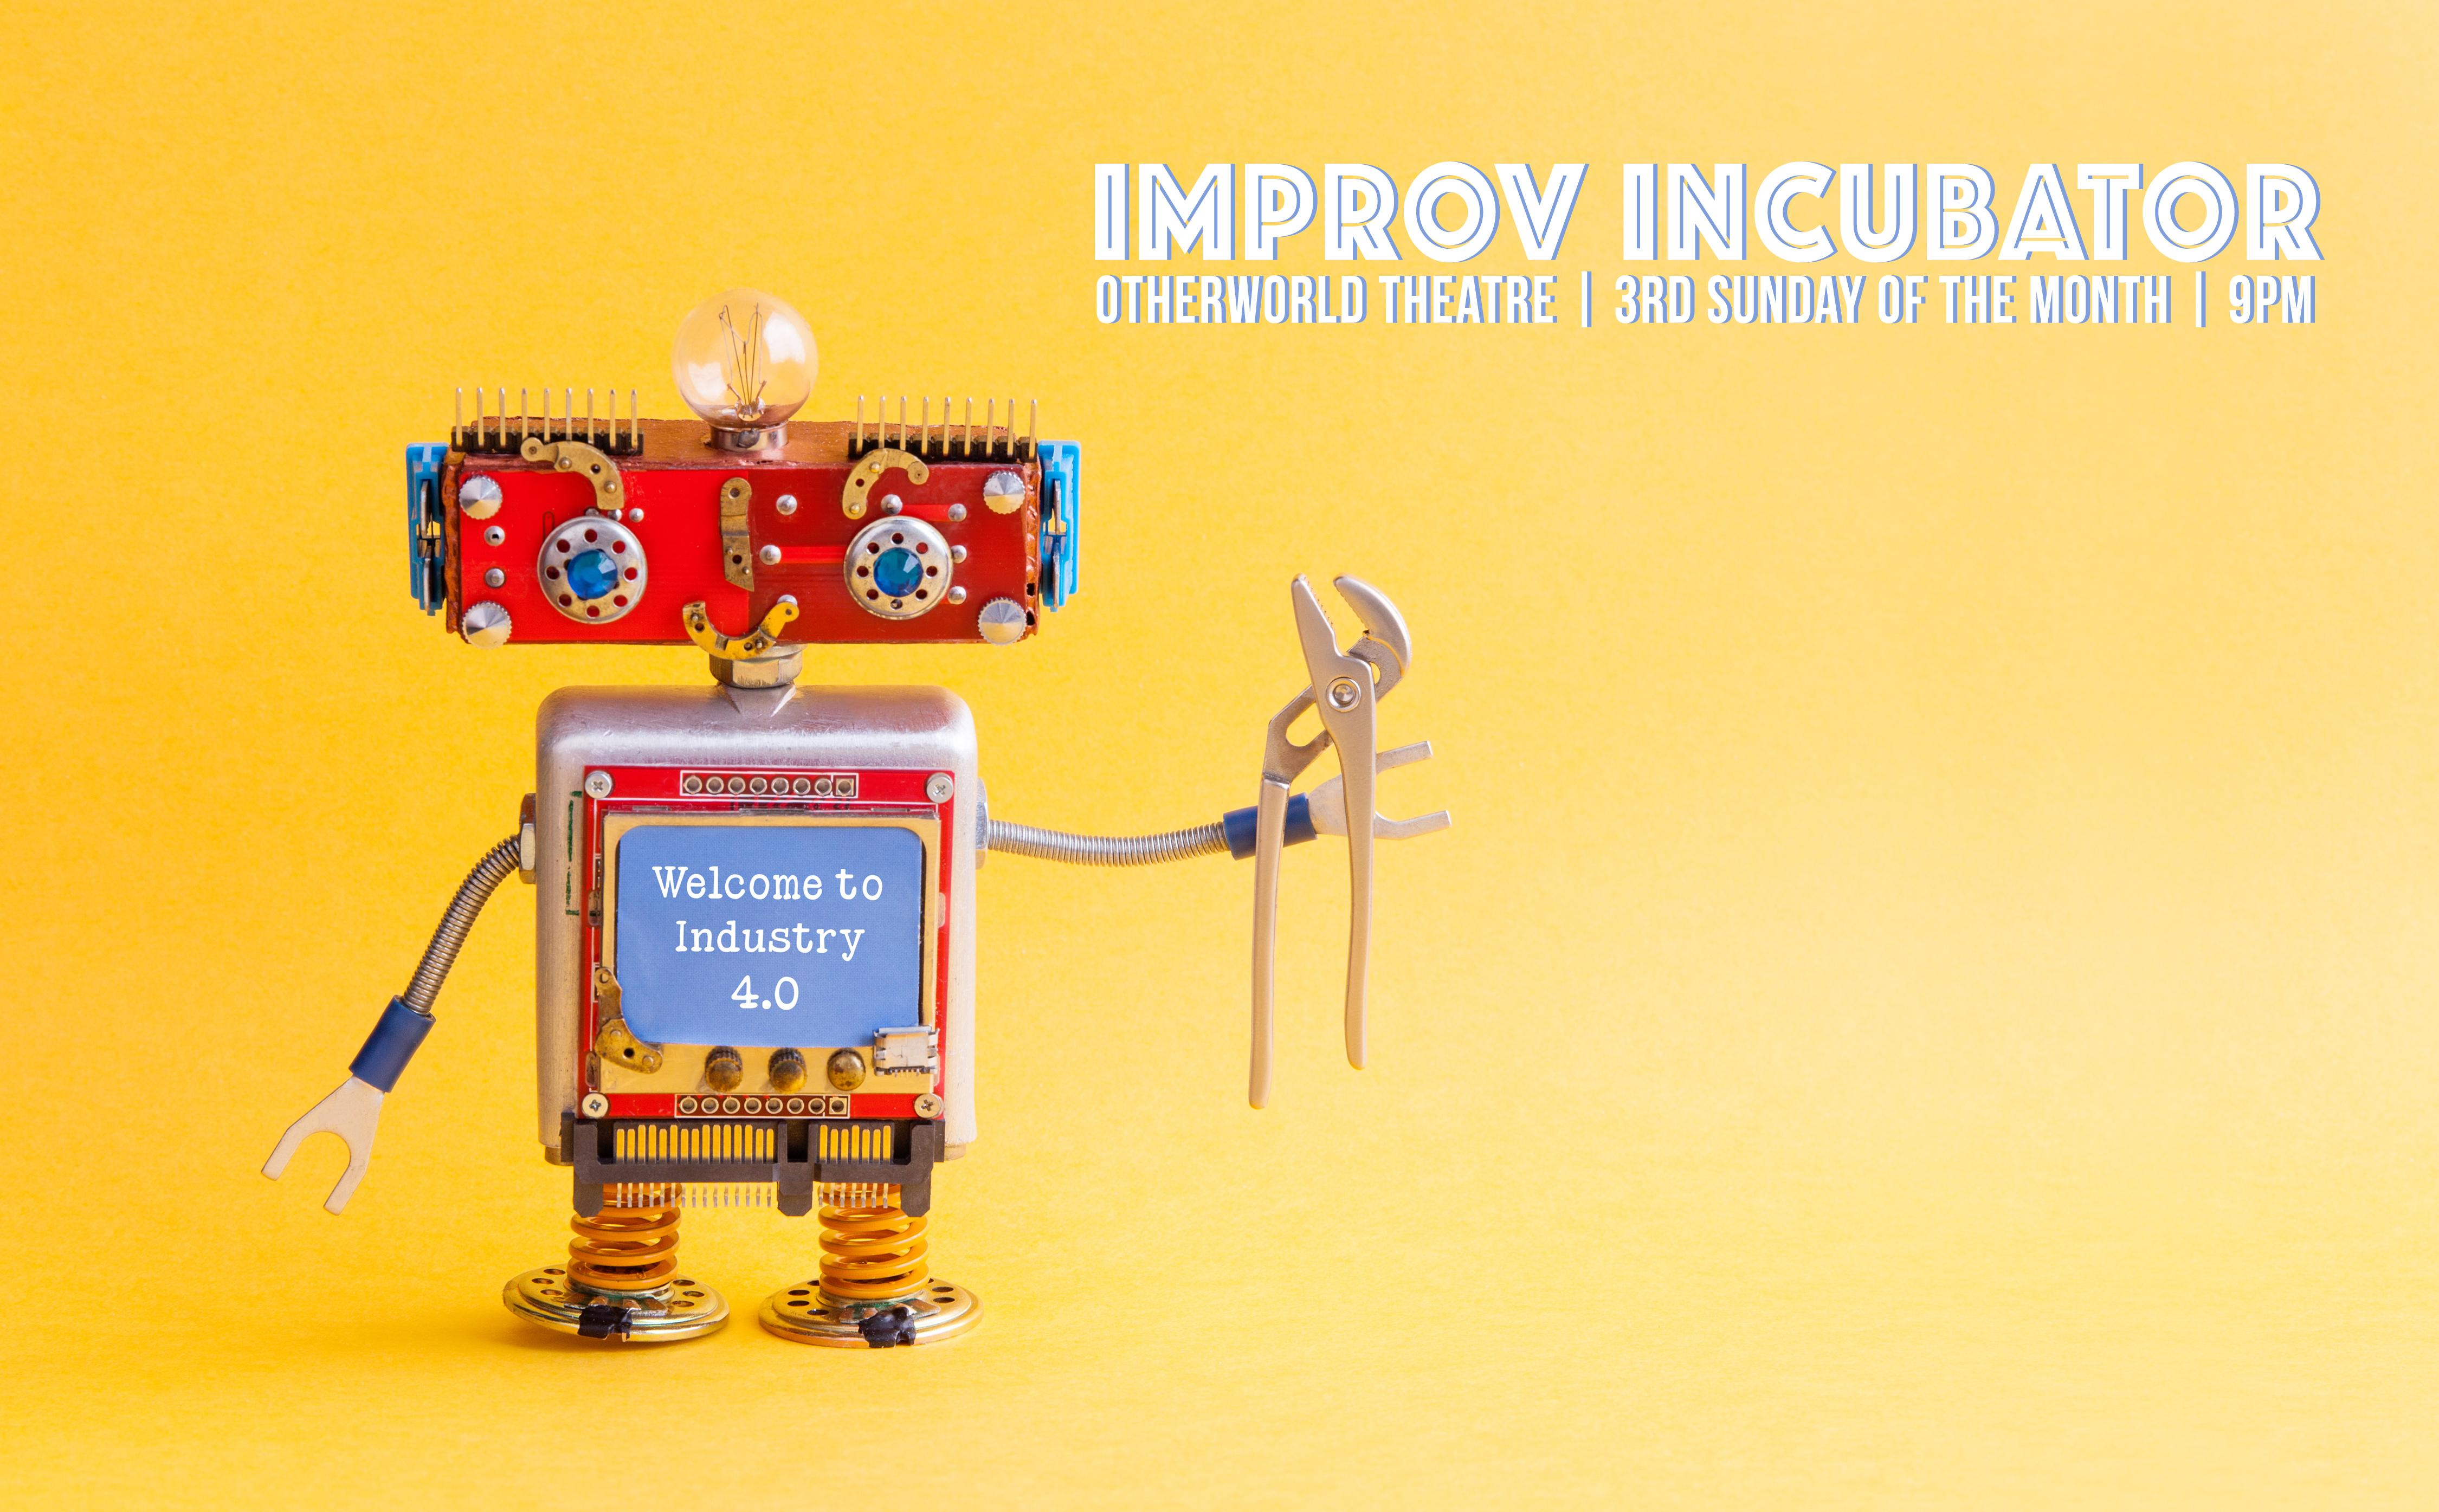 Improv Incubator